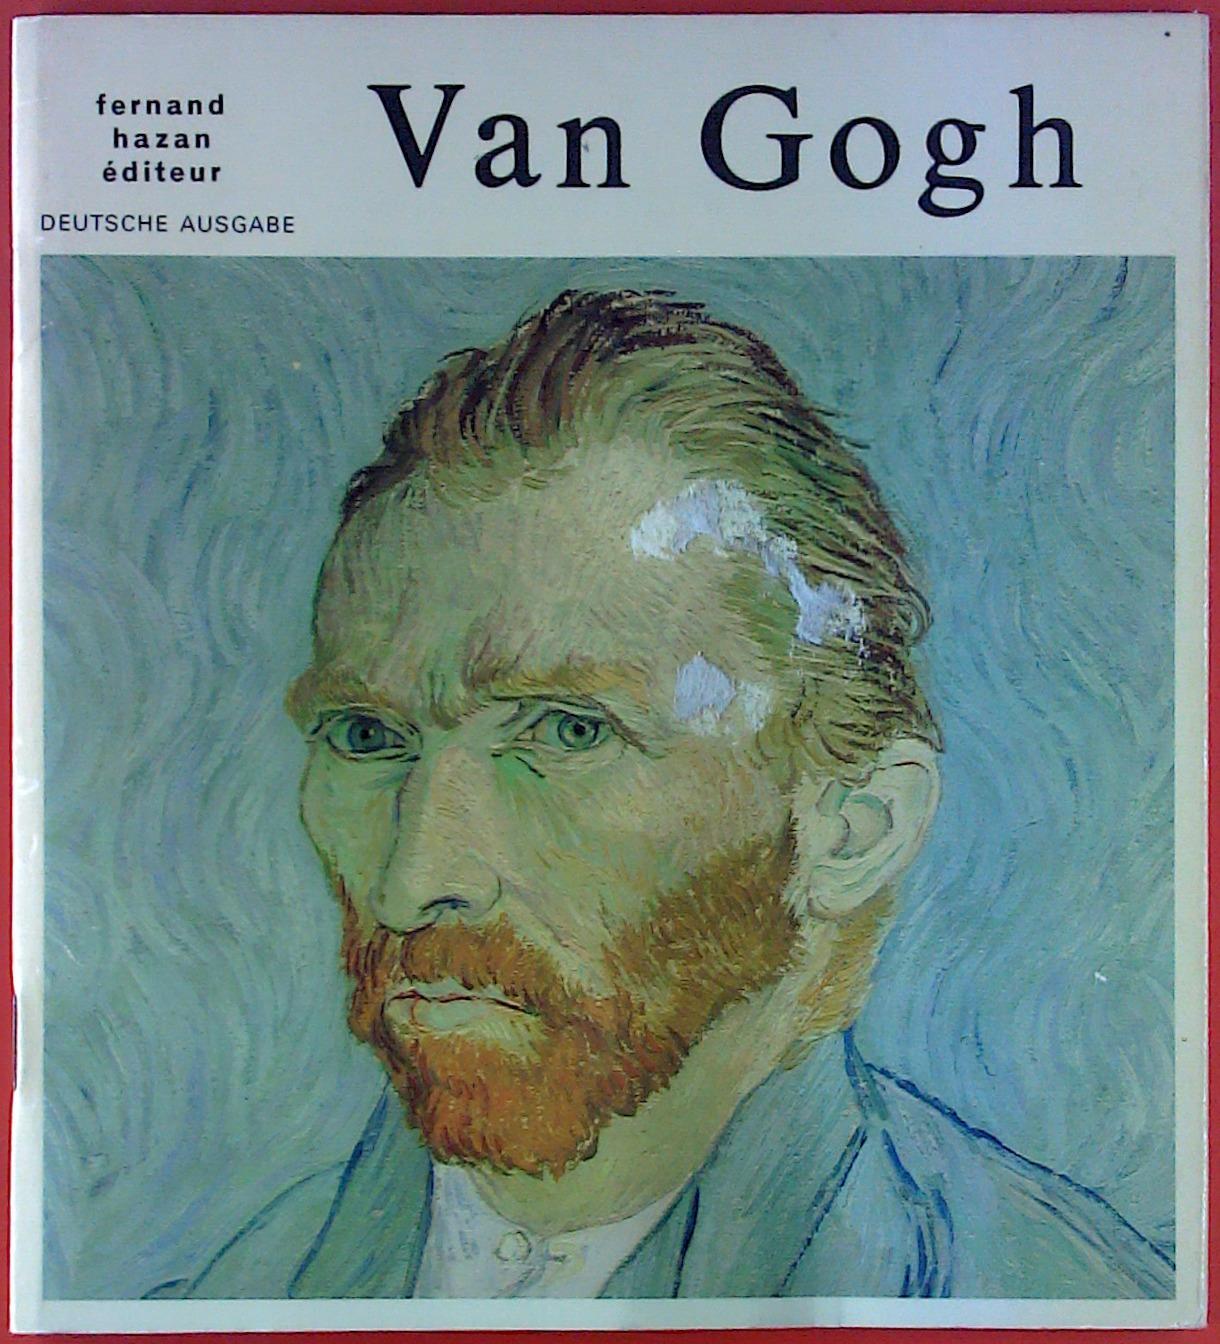 Van Gogh: Hrsg. Fernand Hazan